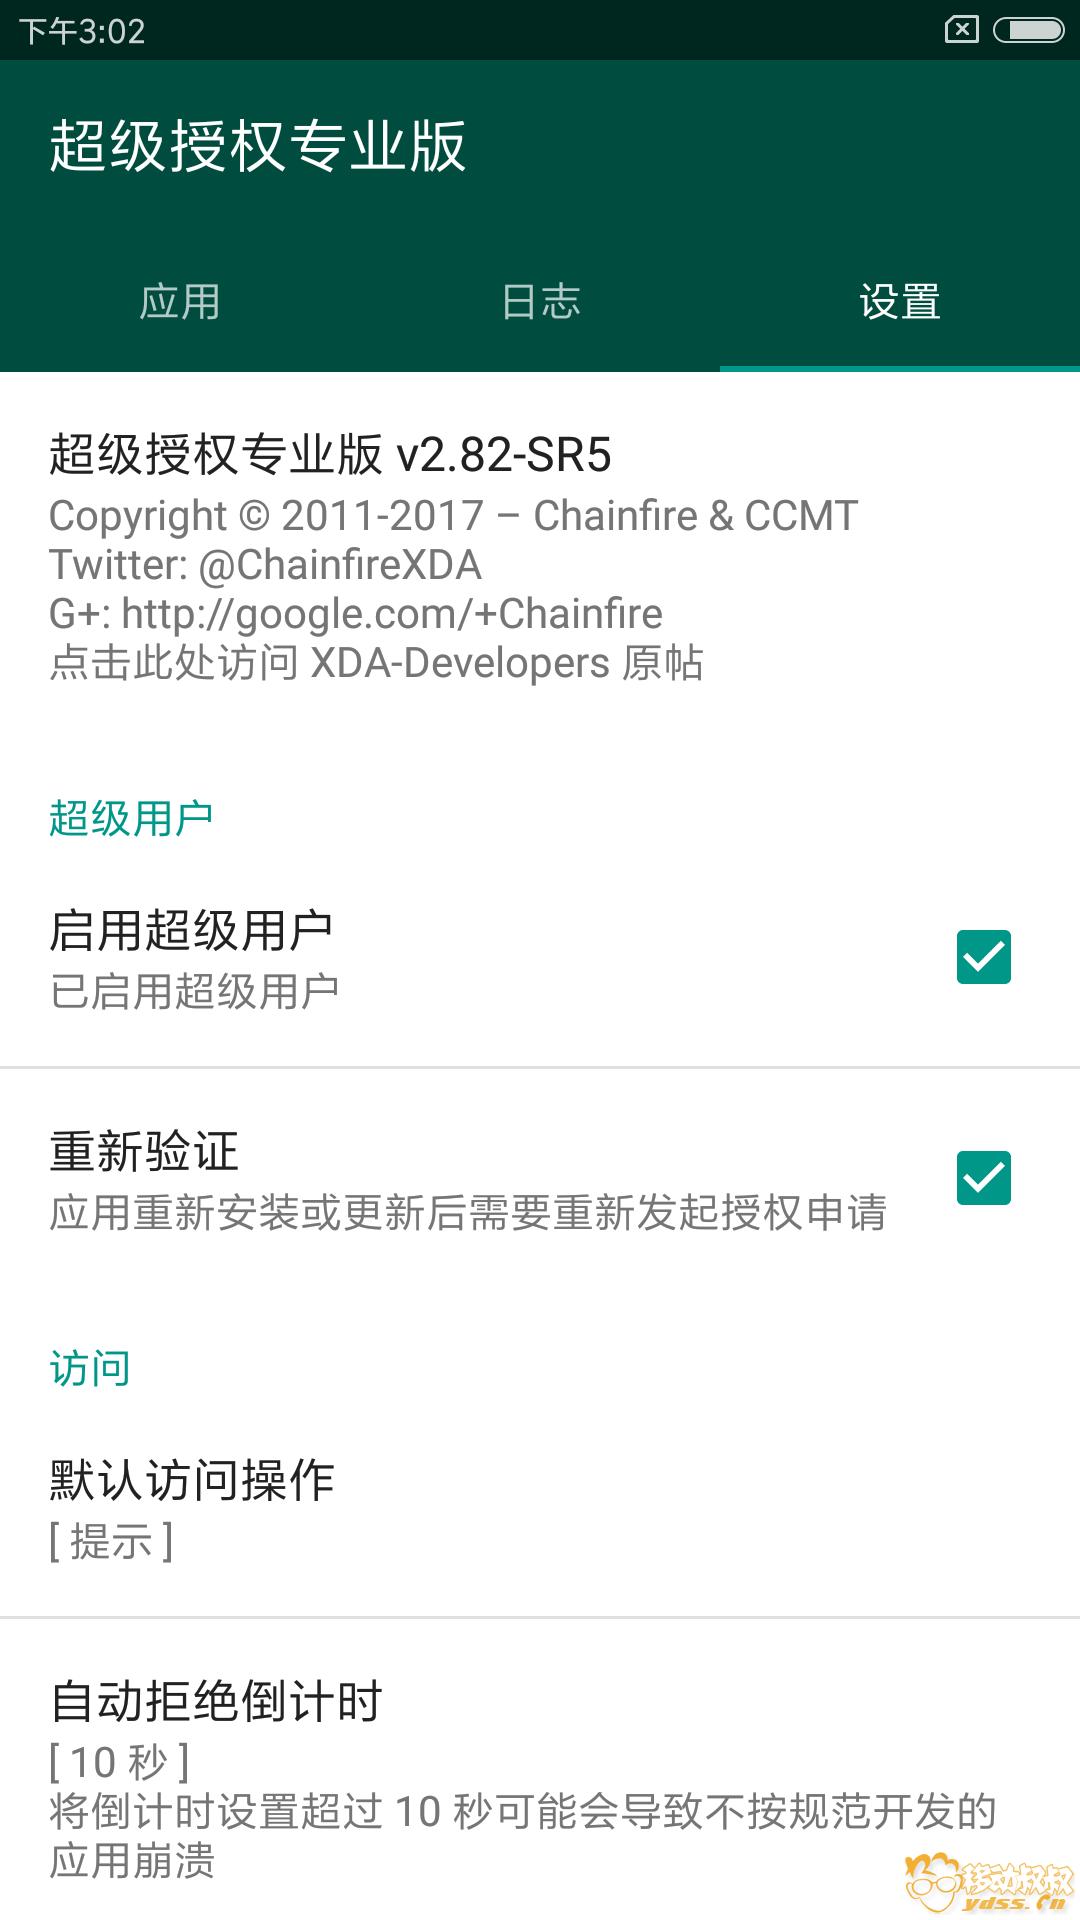 Screenshot_2018-05-14-15-02-12-171_eu.chainfire.supersu.png